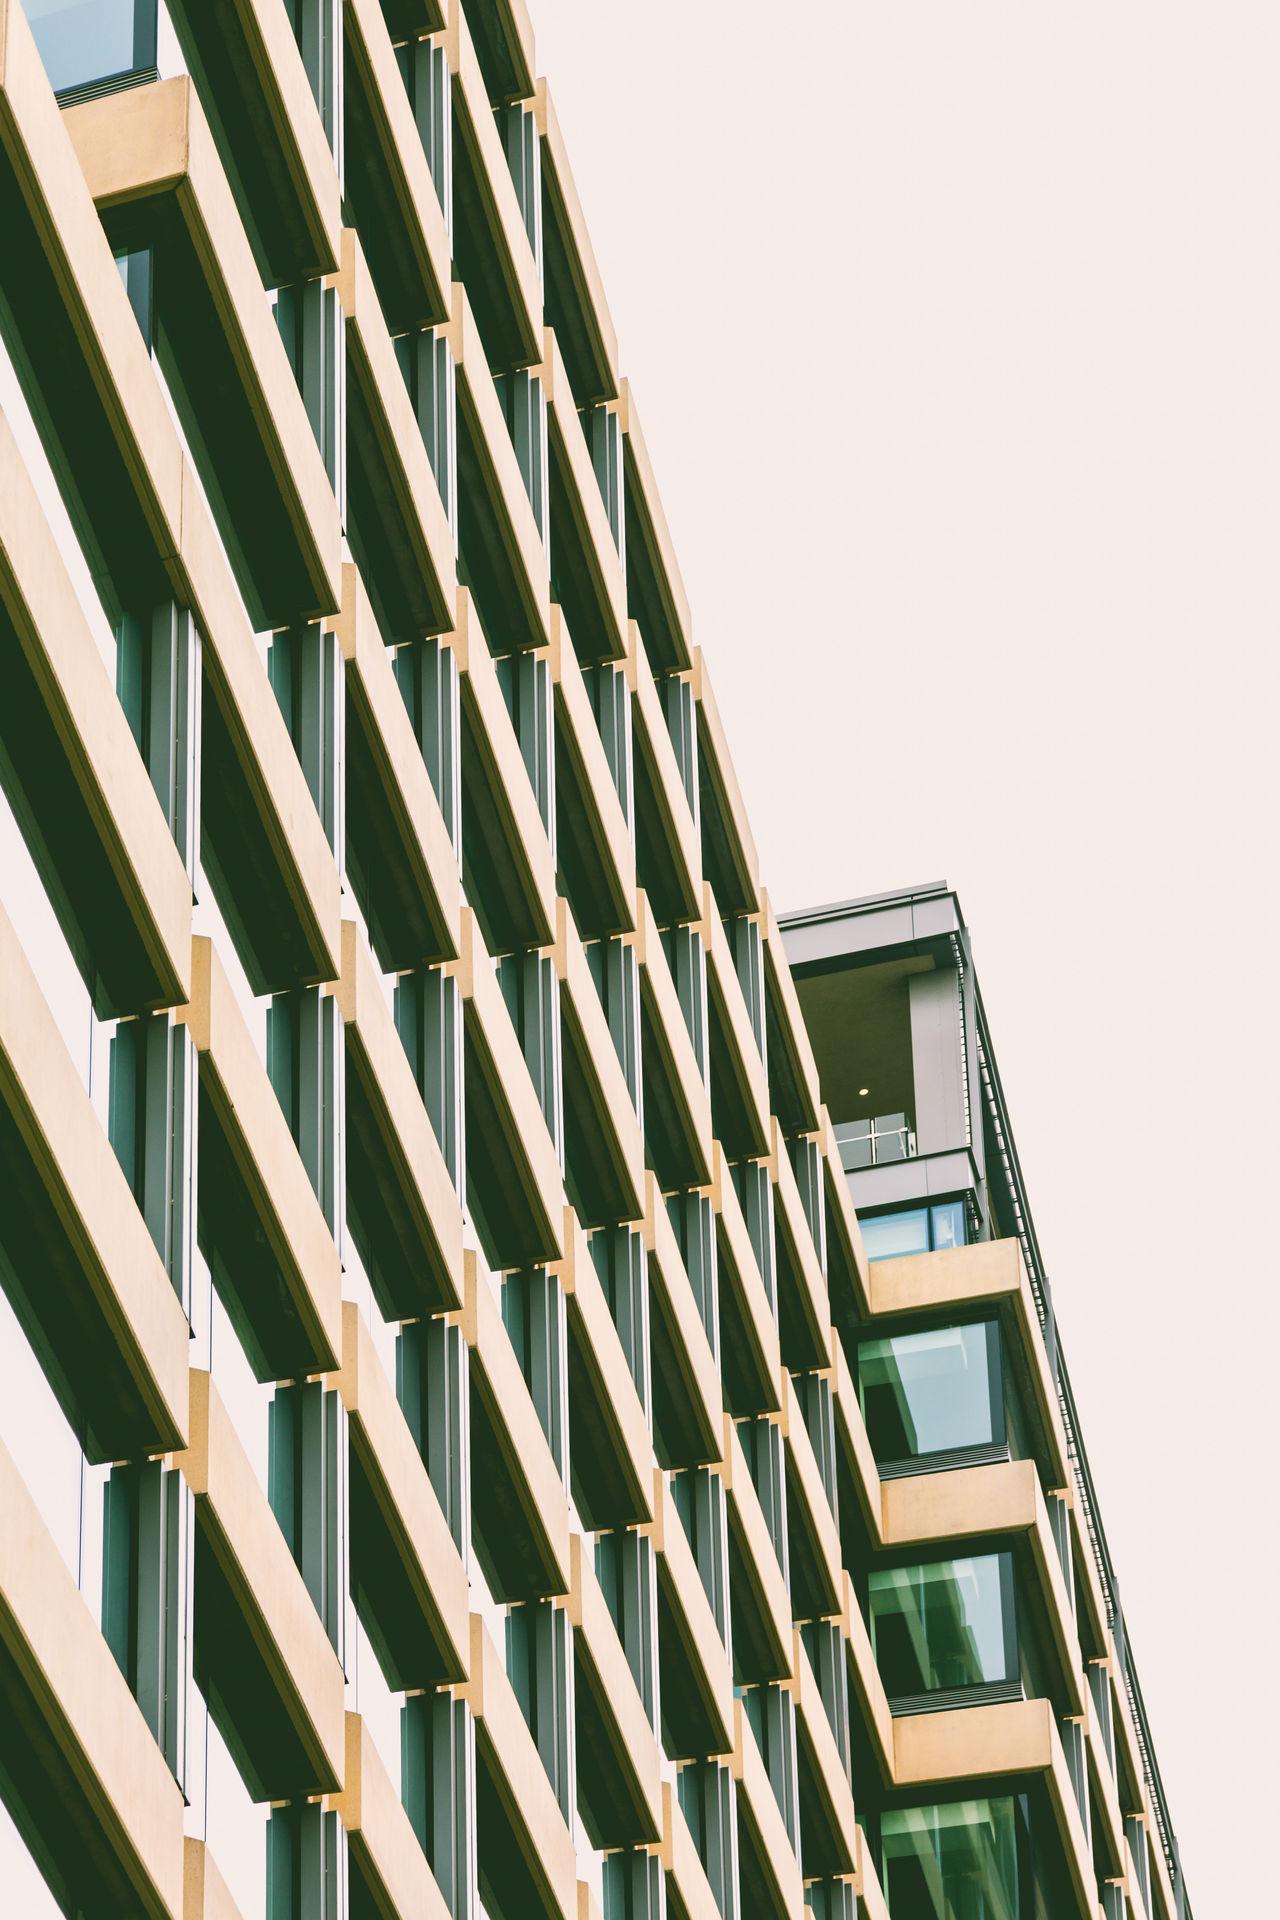 Beautiful stock photos of kreuz, architecture, building exterior, built structure, low angle view